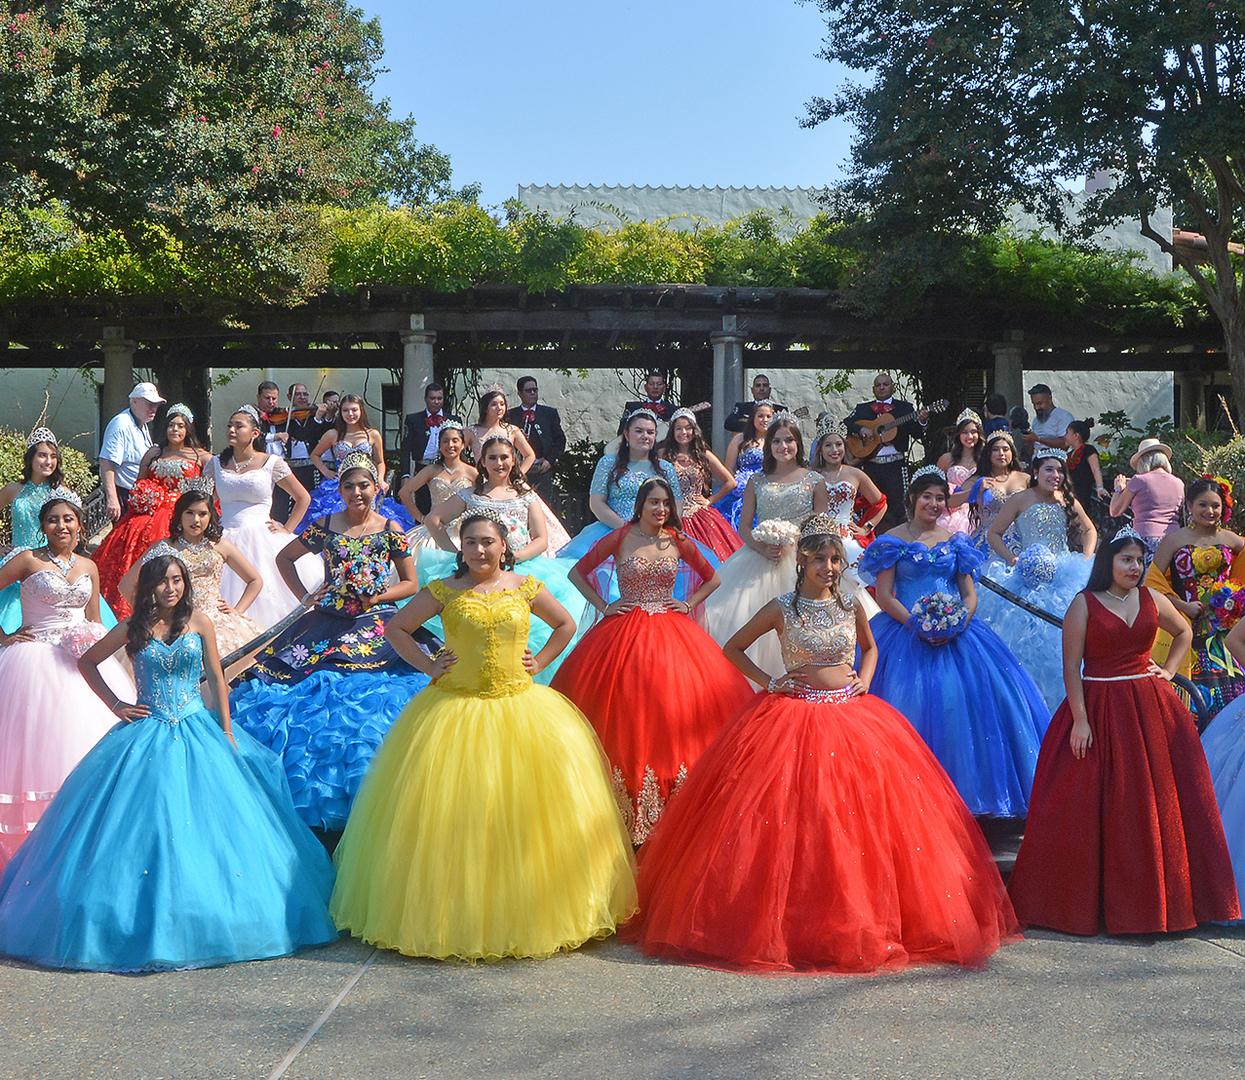 Dallas Arboretum Kicks Off Fourth Annual Hispanic Heritage Celebration